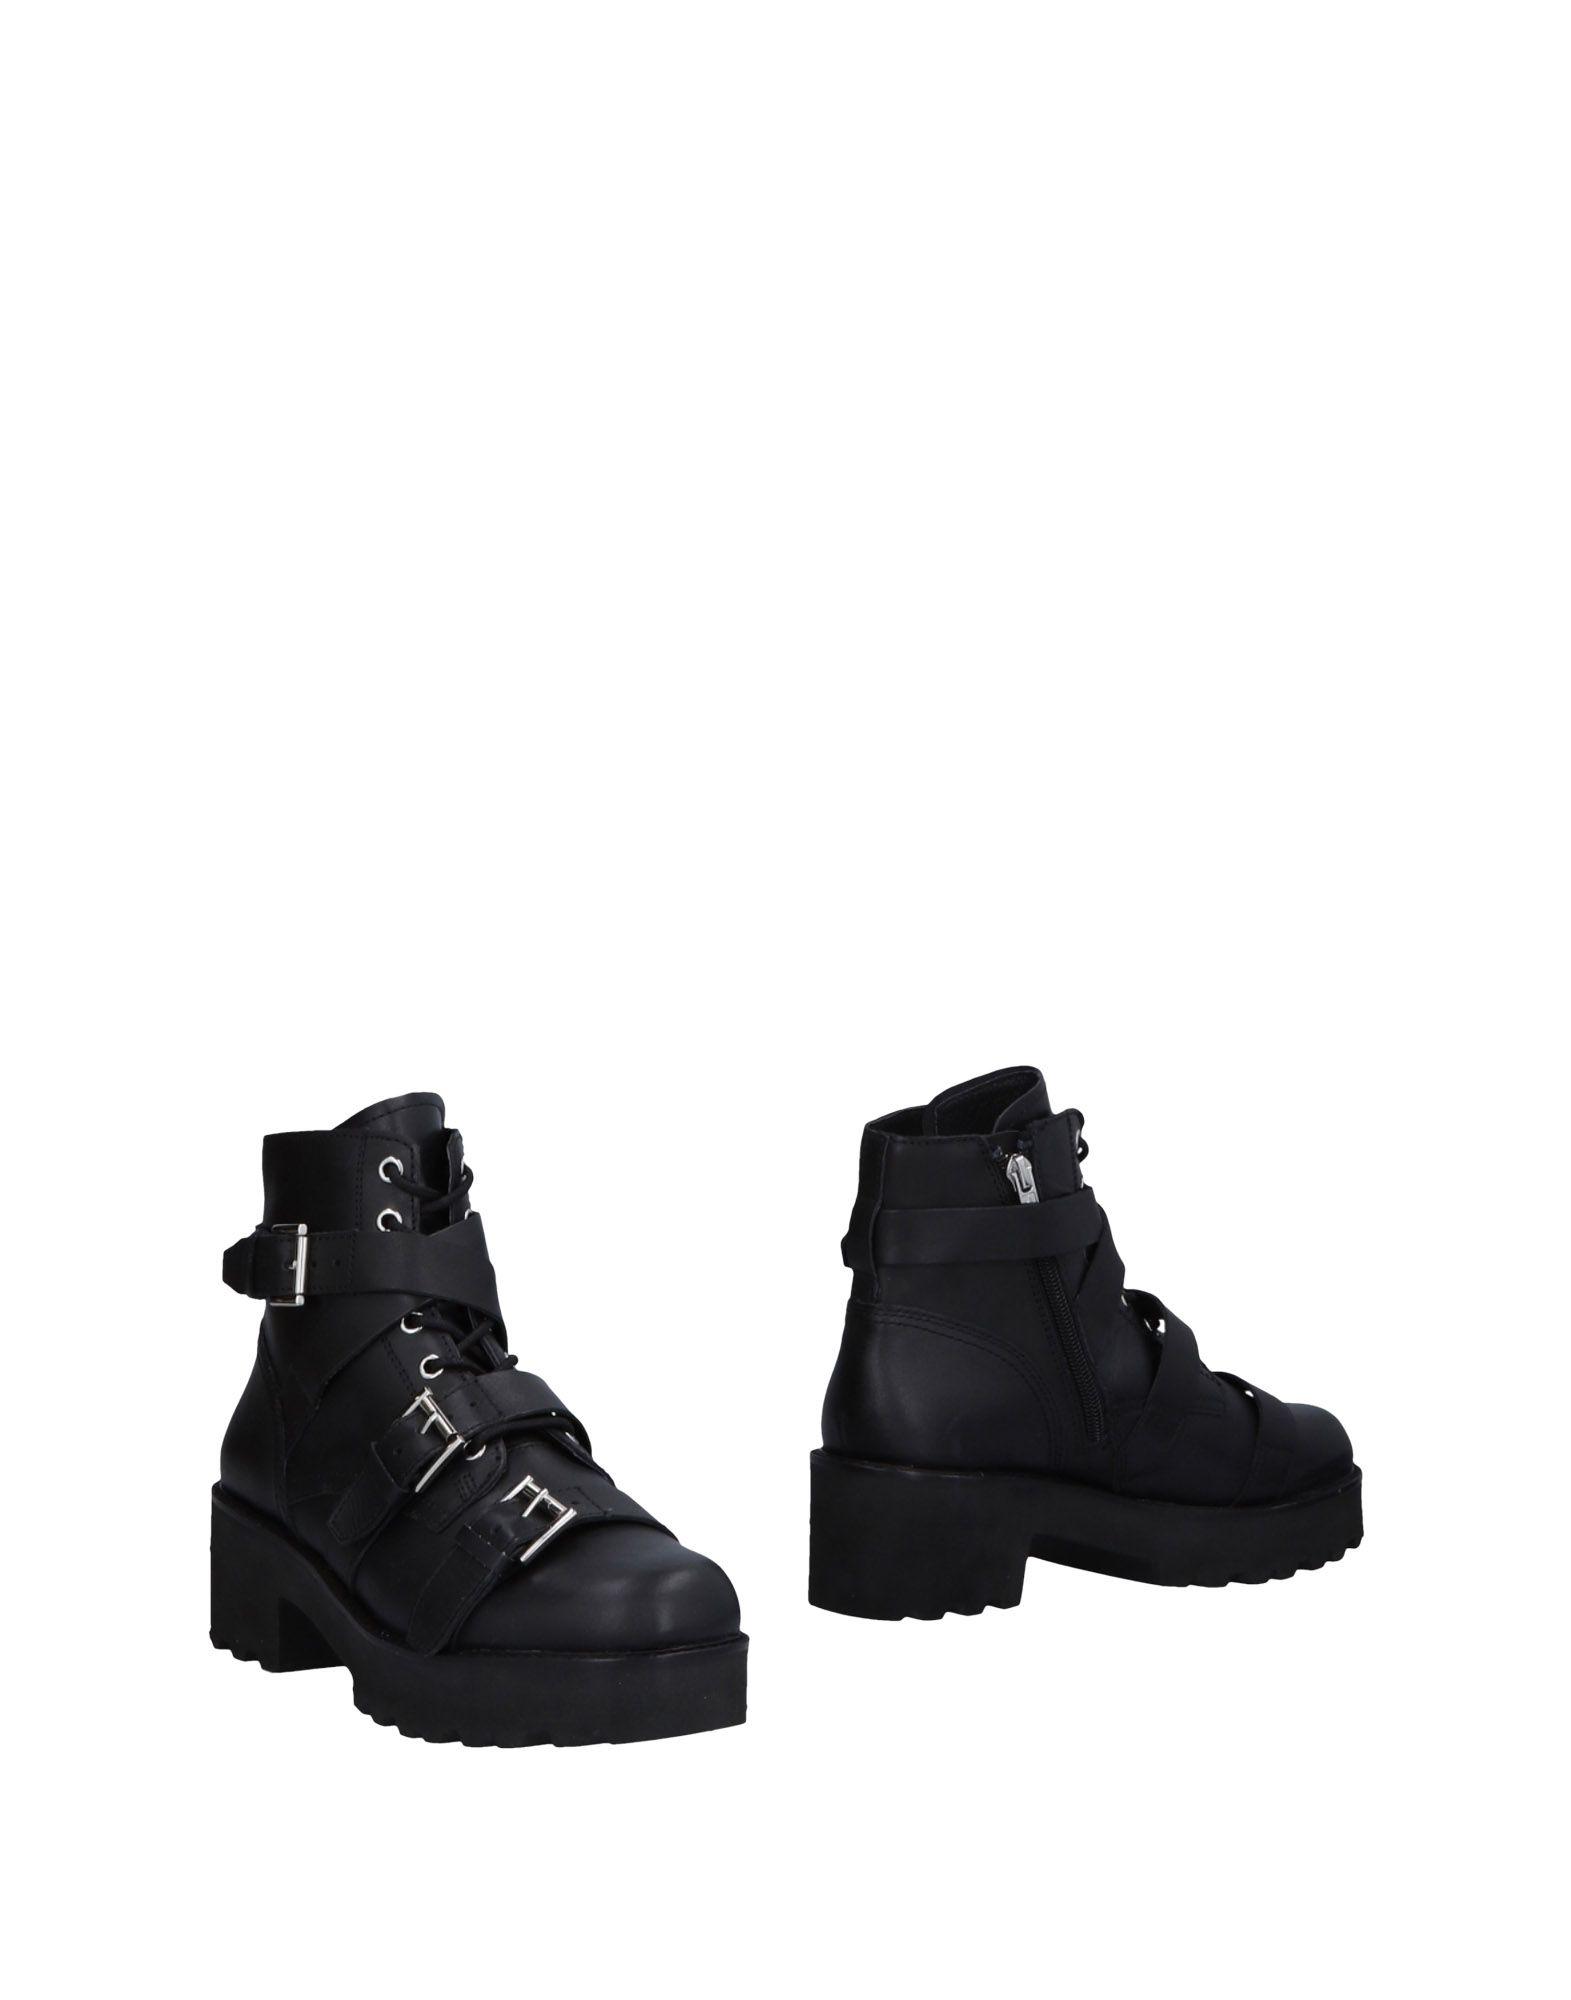 Stilvolle billige Schuhe Ash Stiefelette Damen  11477158UJ 11477158UJ 11477158UJ c454ab